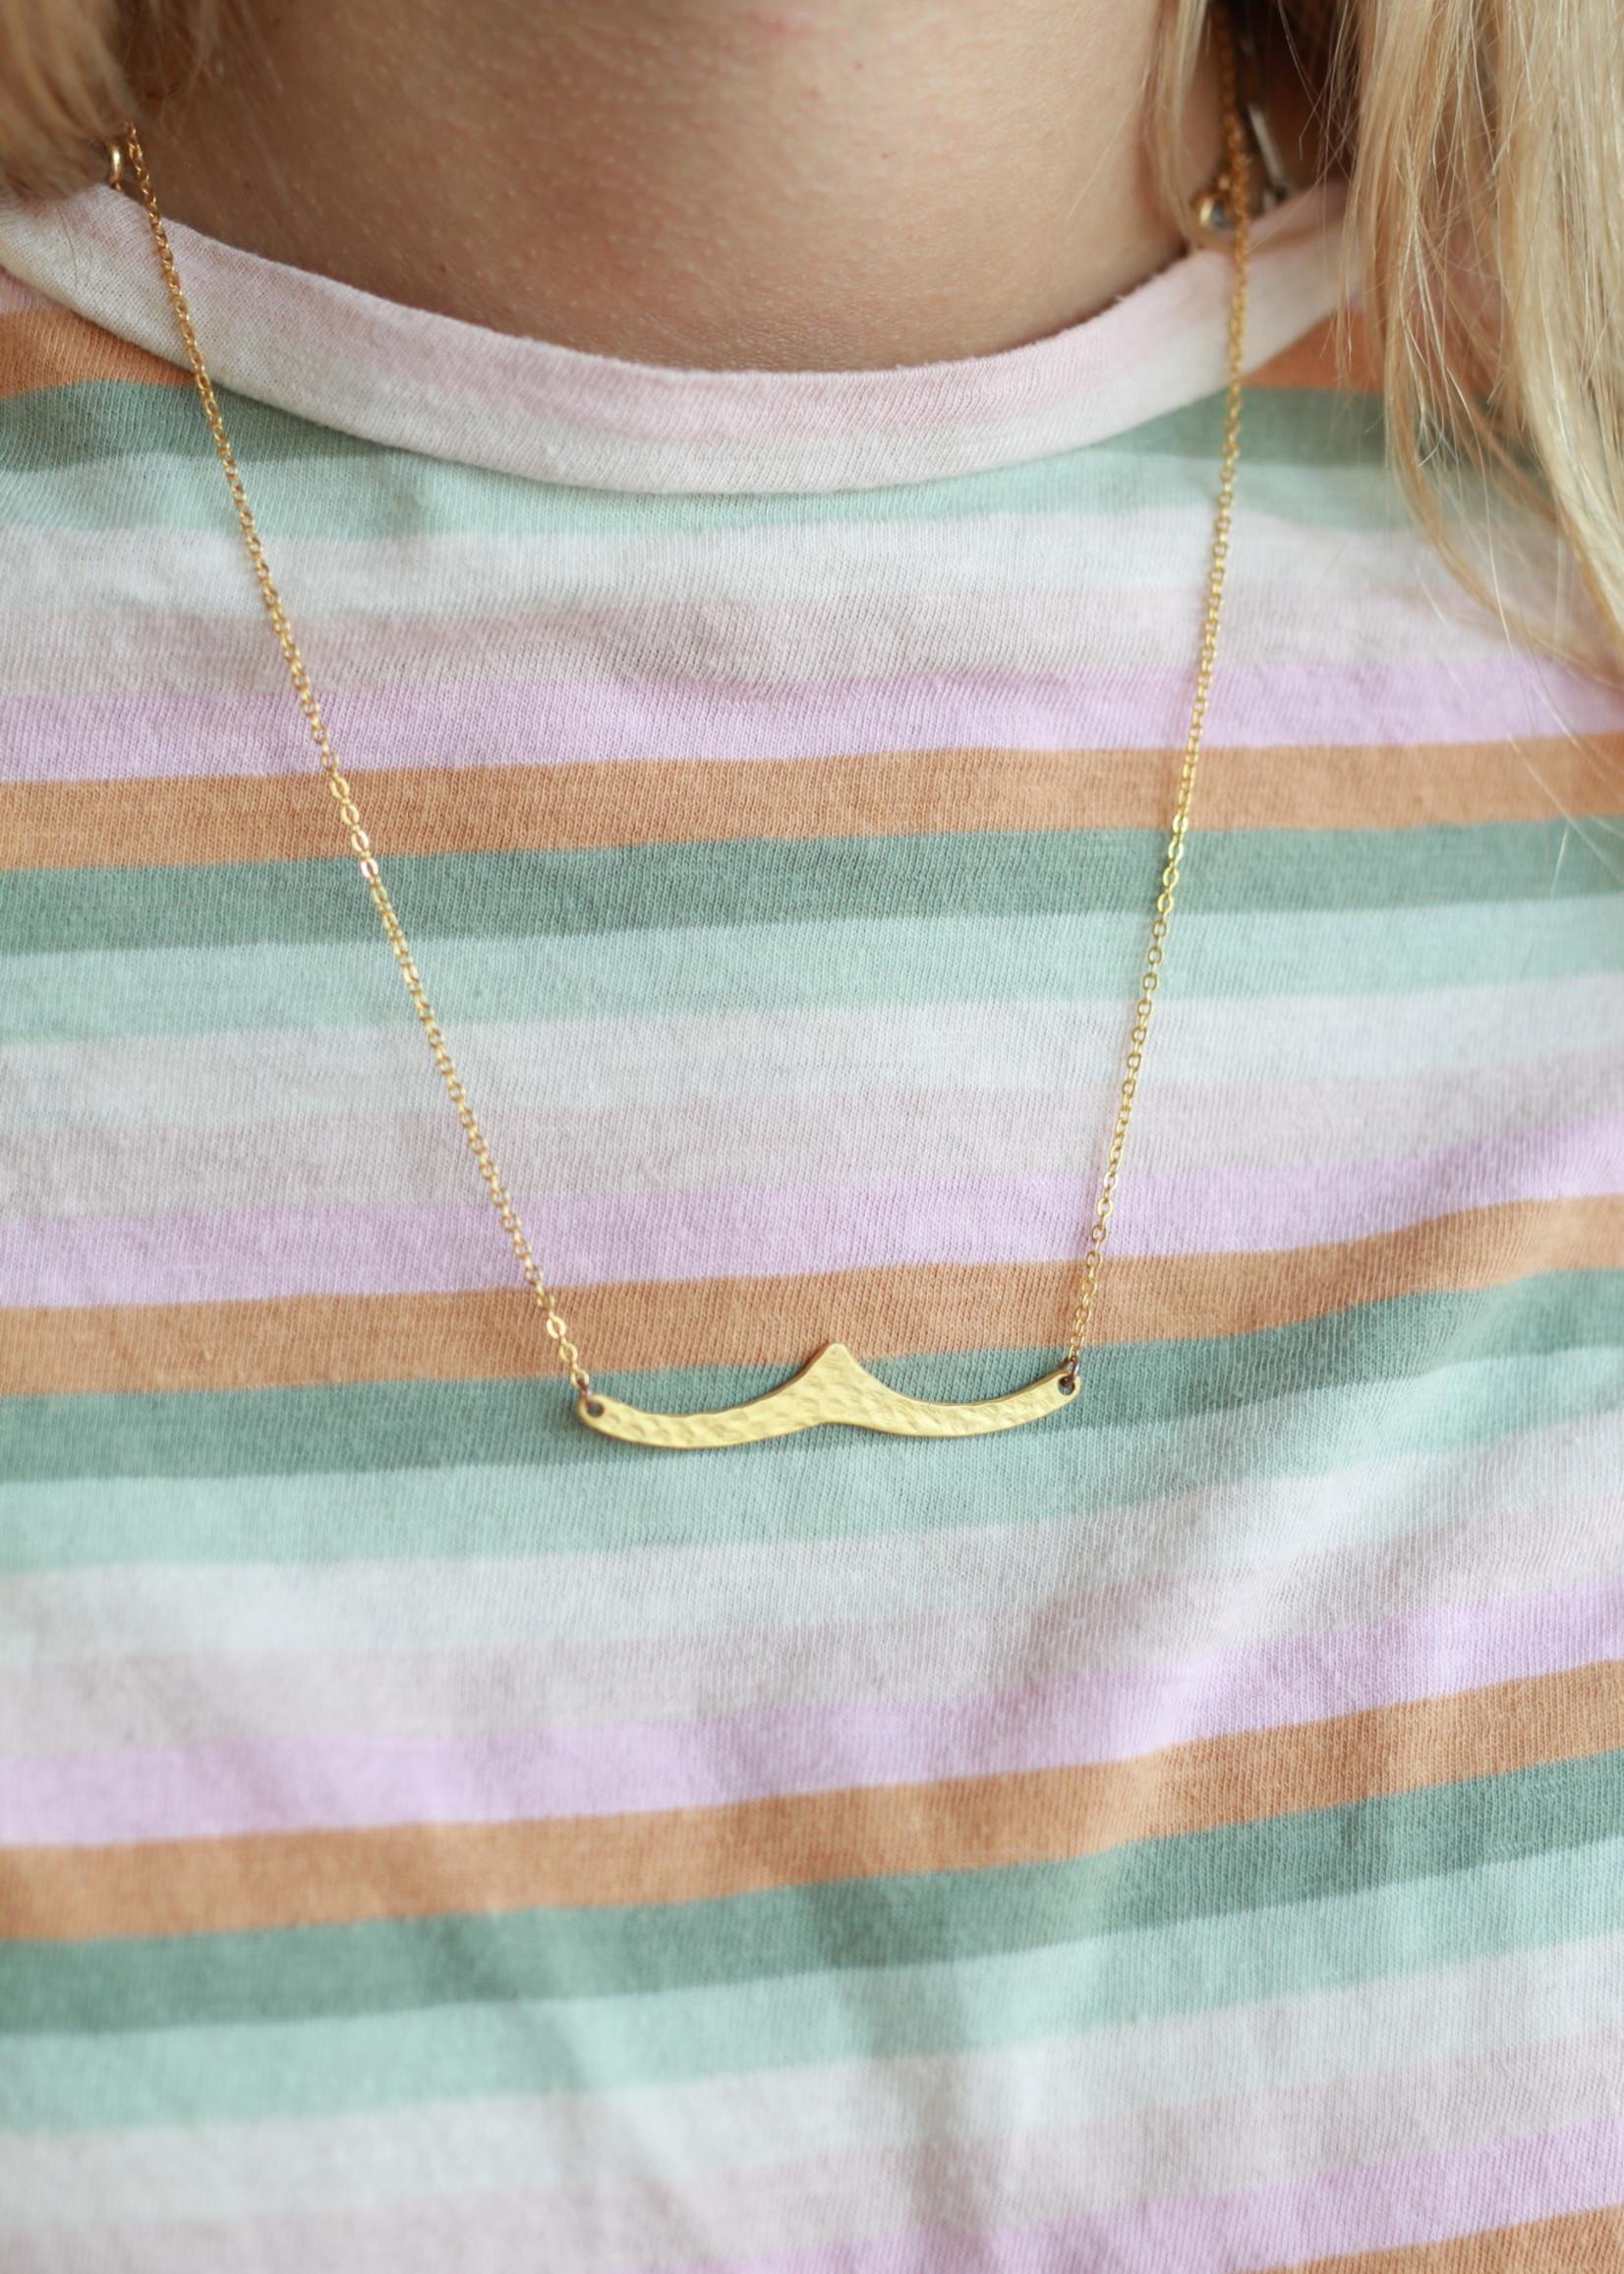 Allison Conway AC Wave Necklace